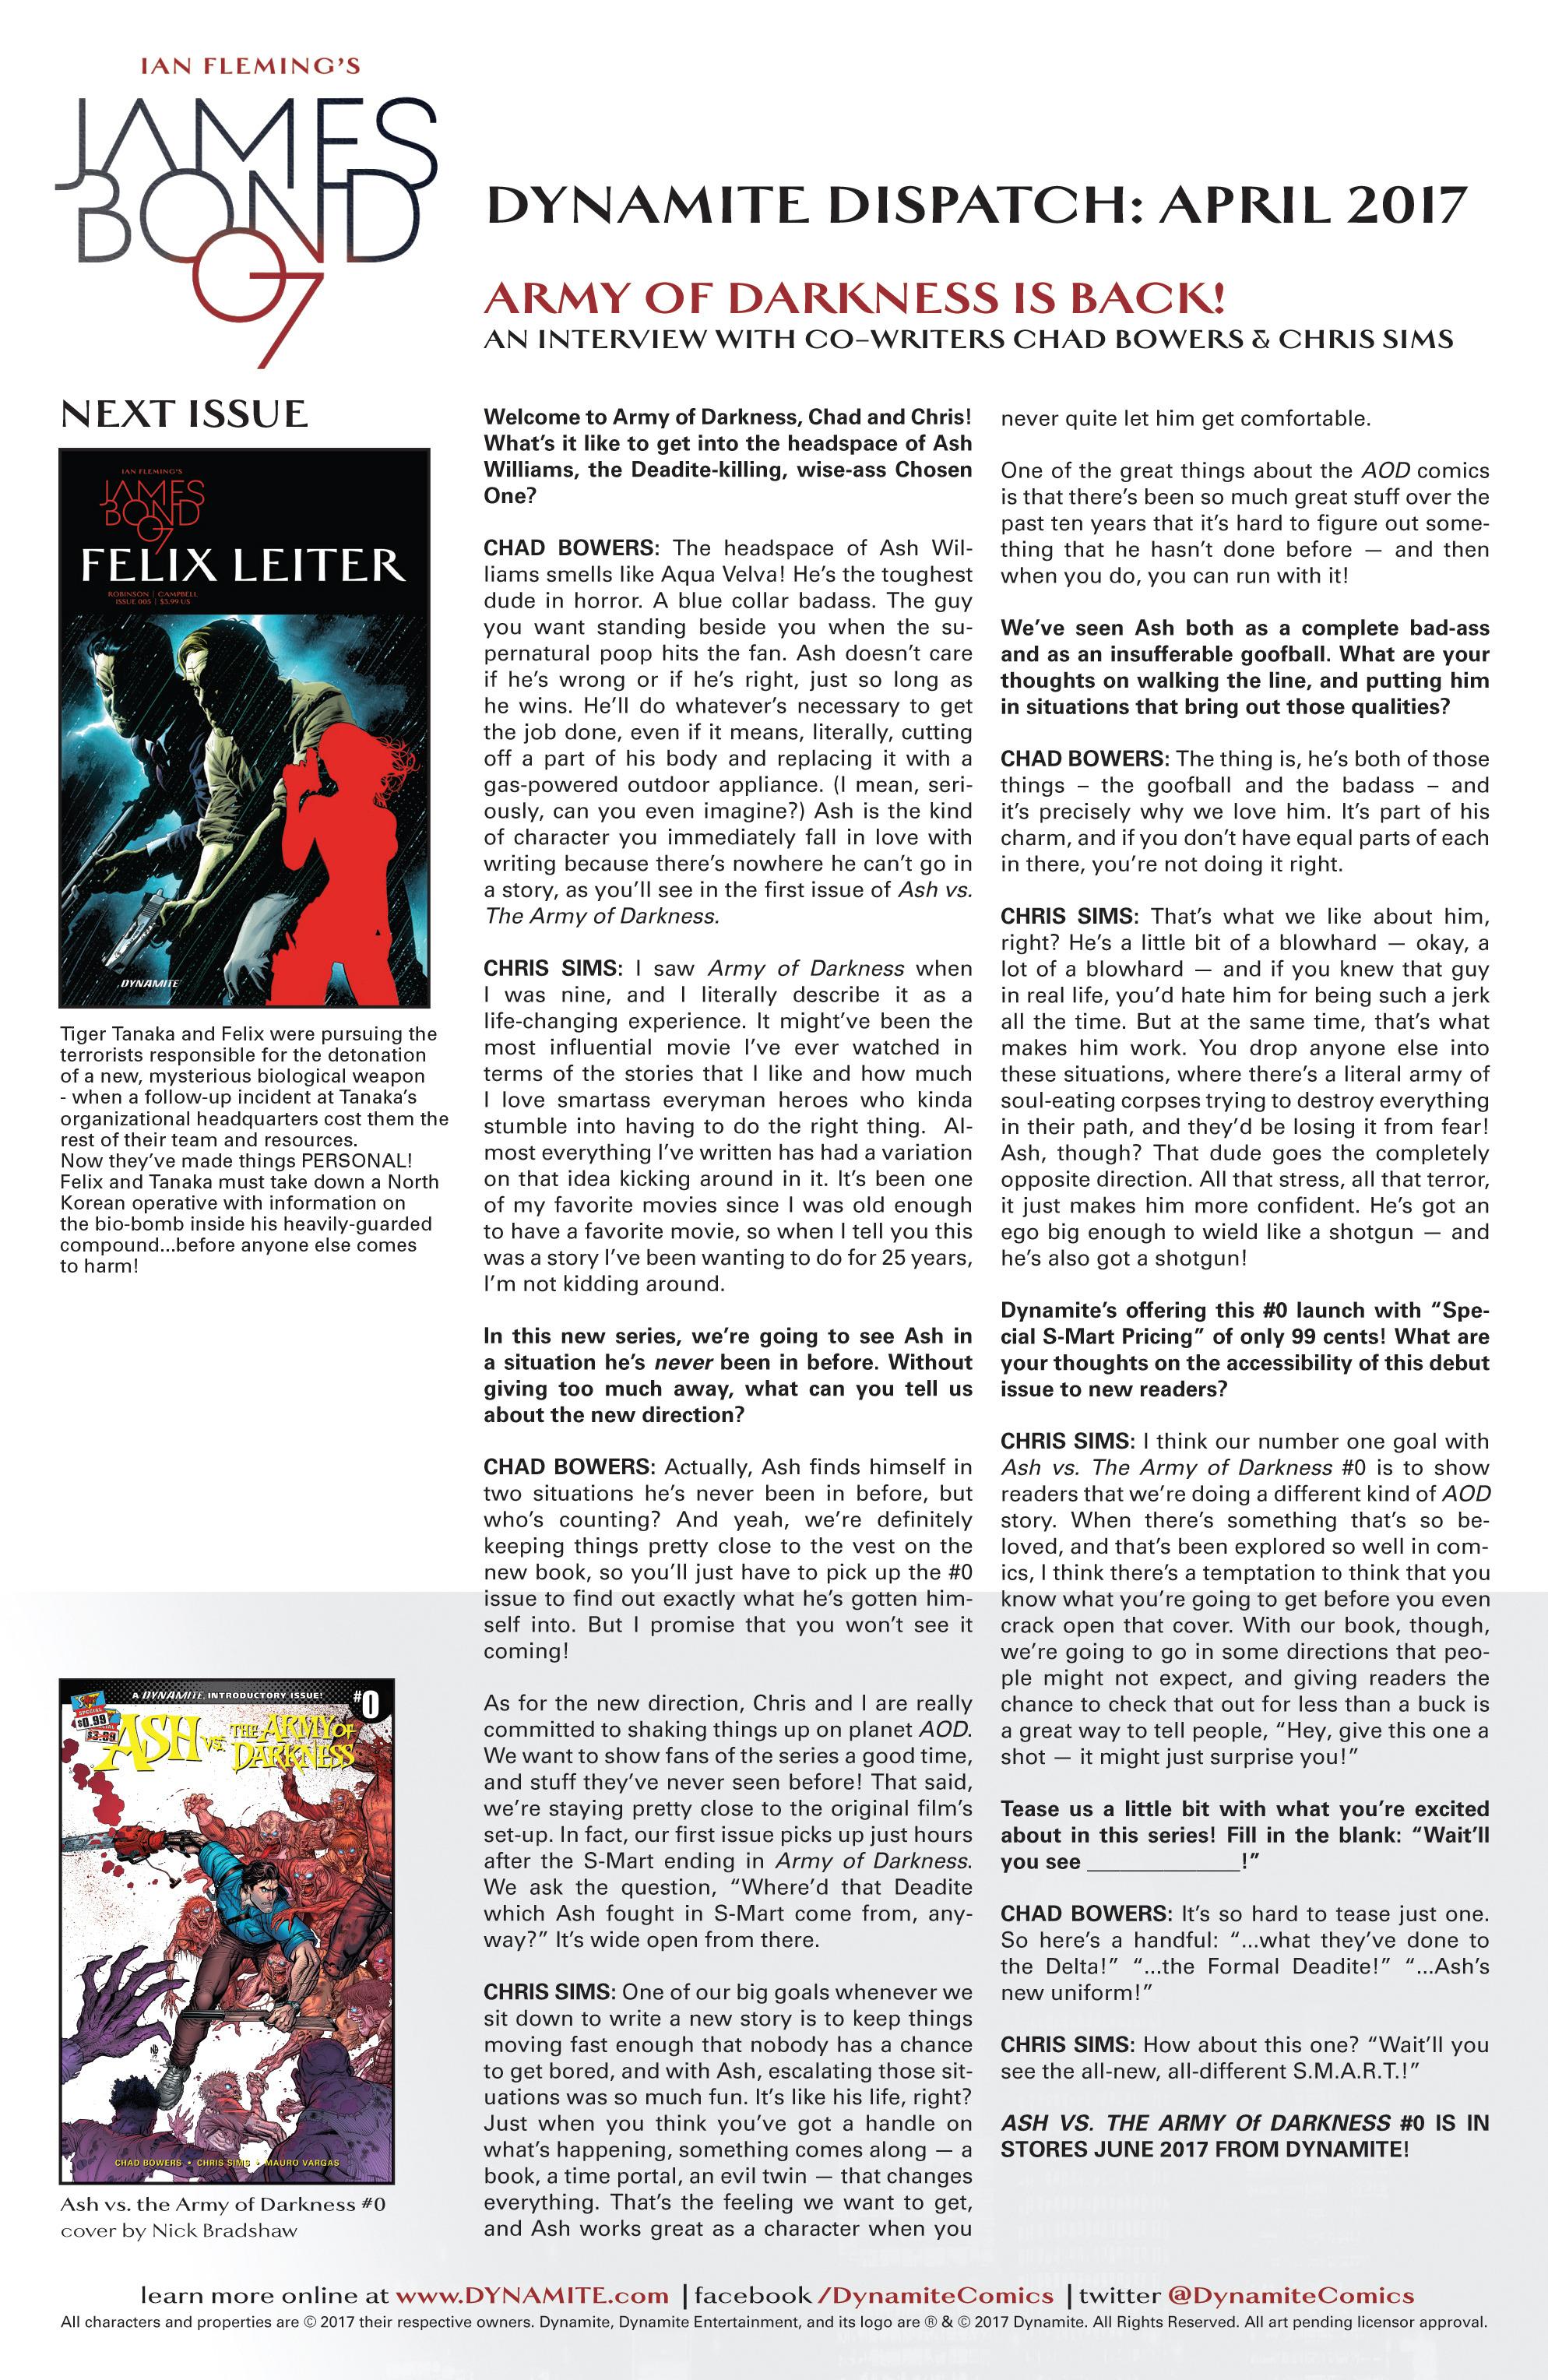 Read online James Bond: Felix Leiter comic -  Issue #4 - 21